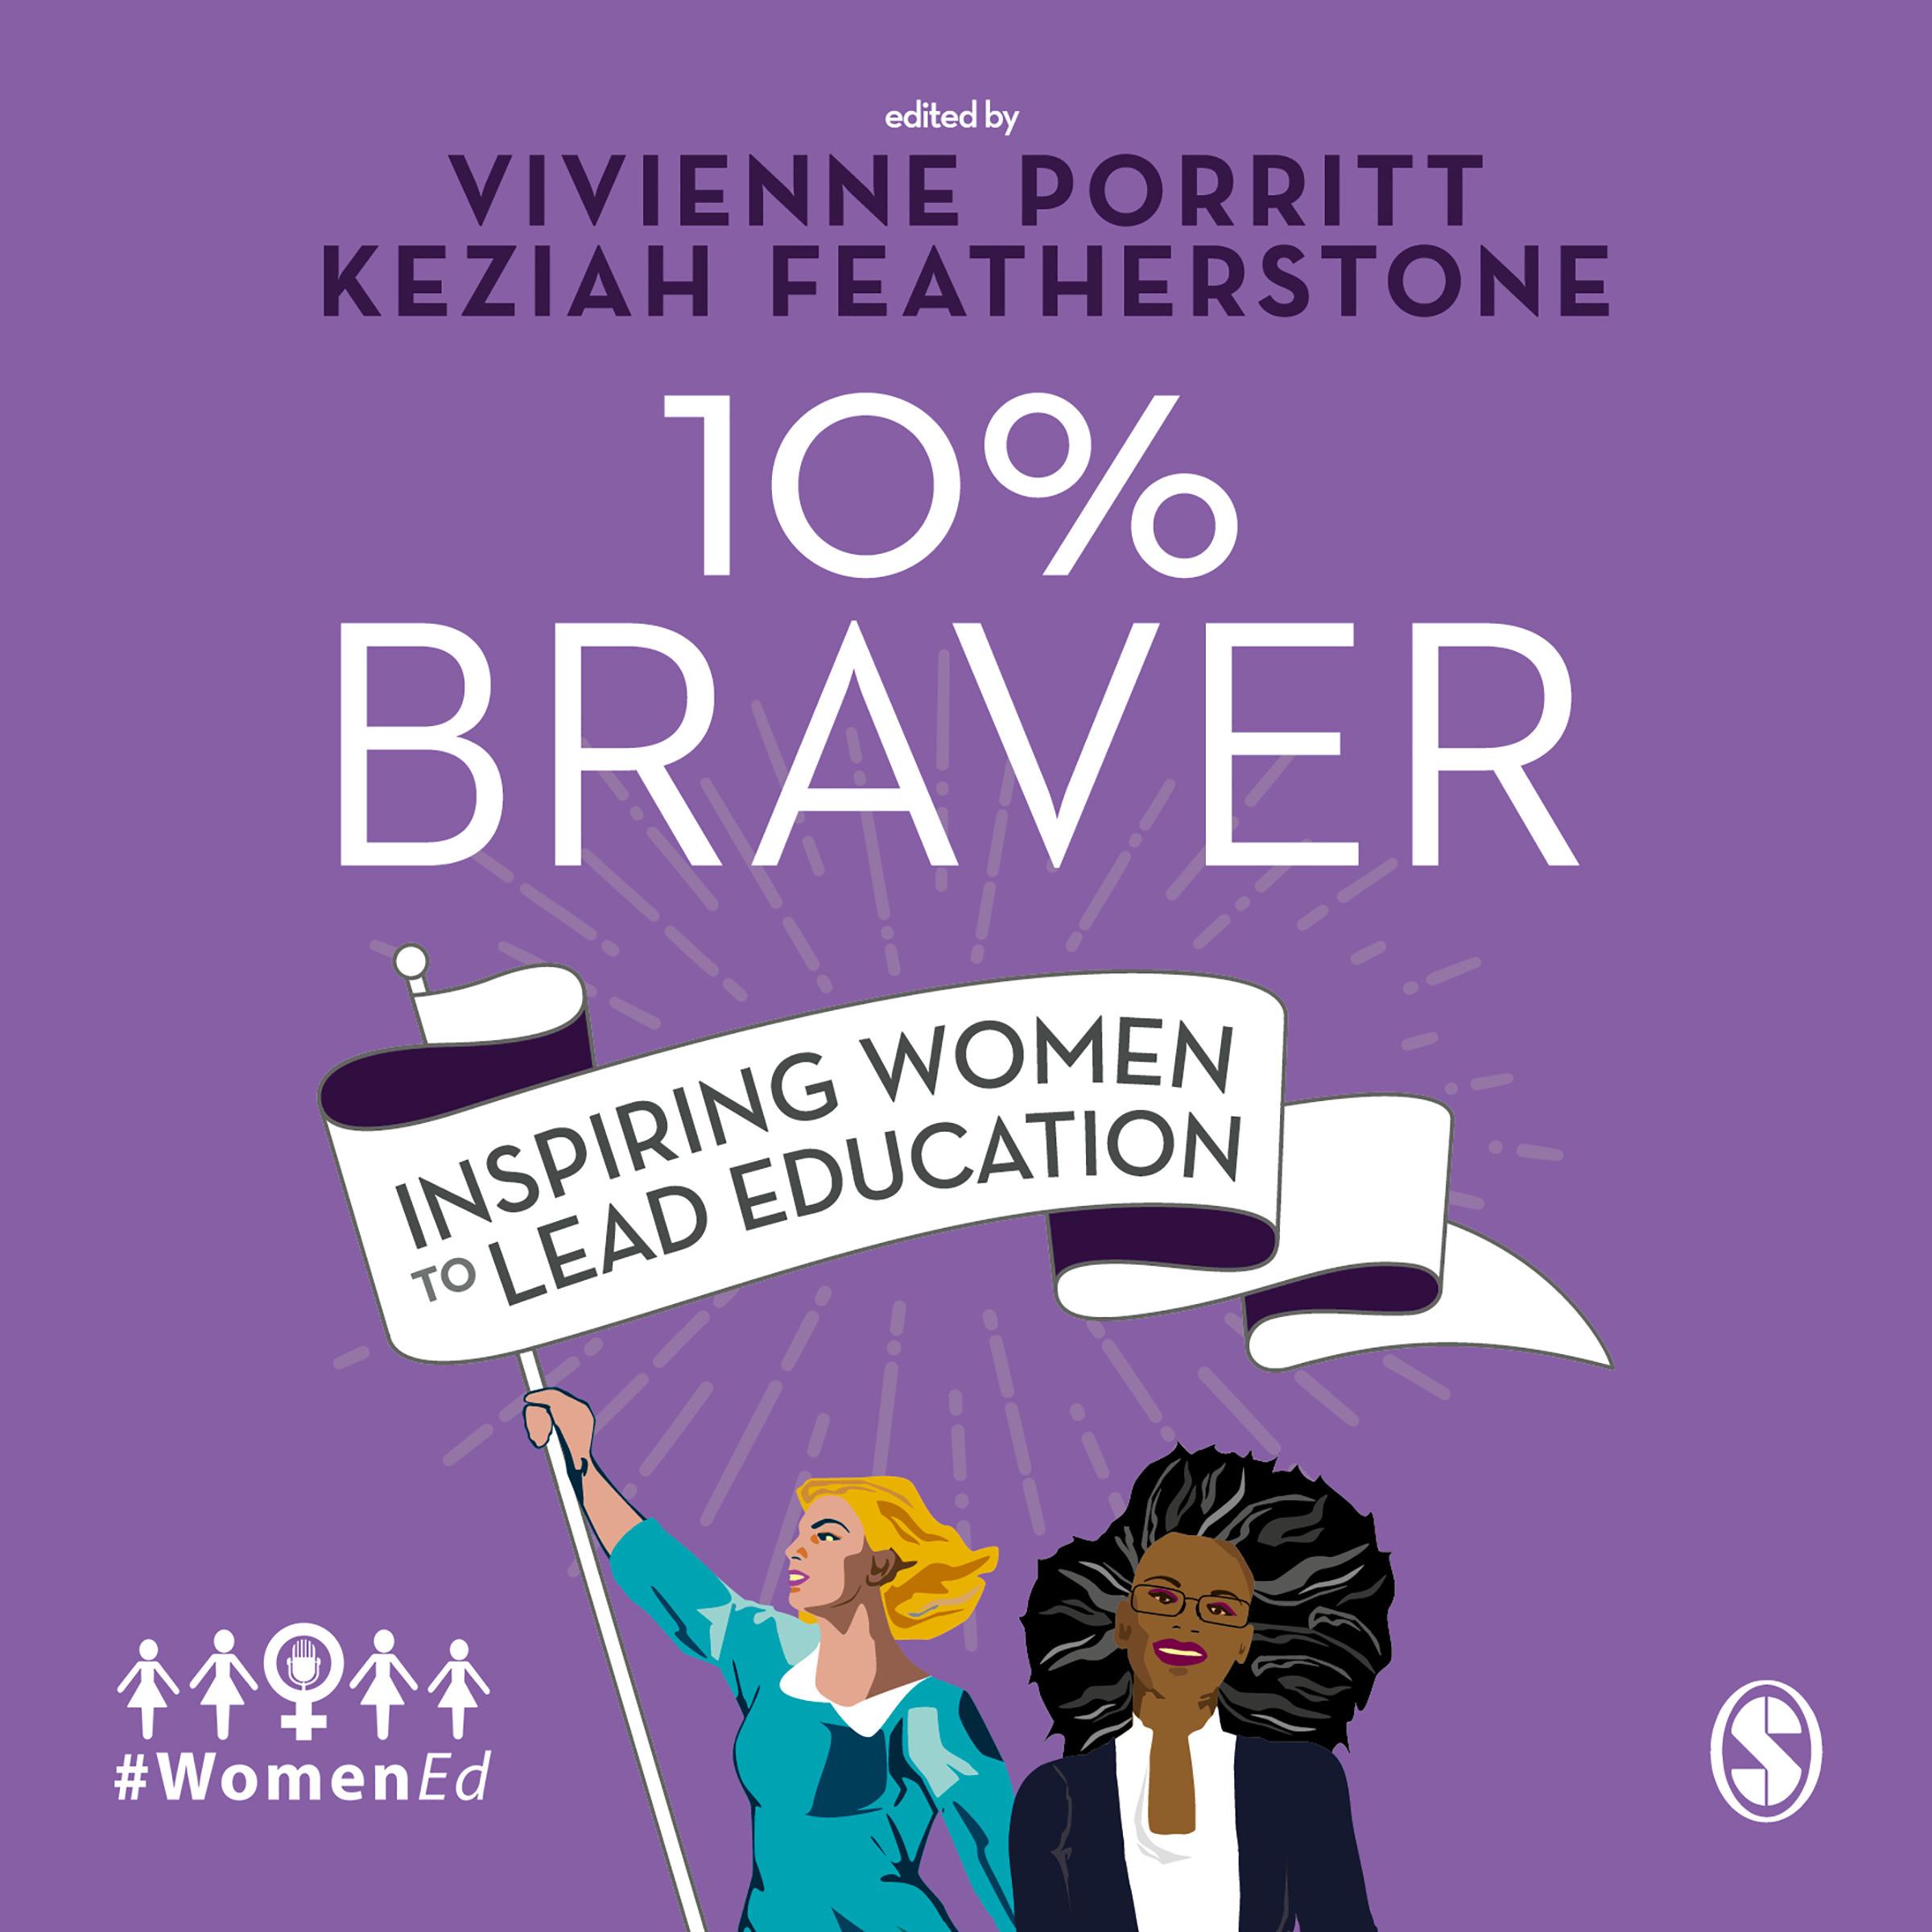 10% Braver image